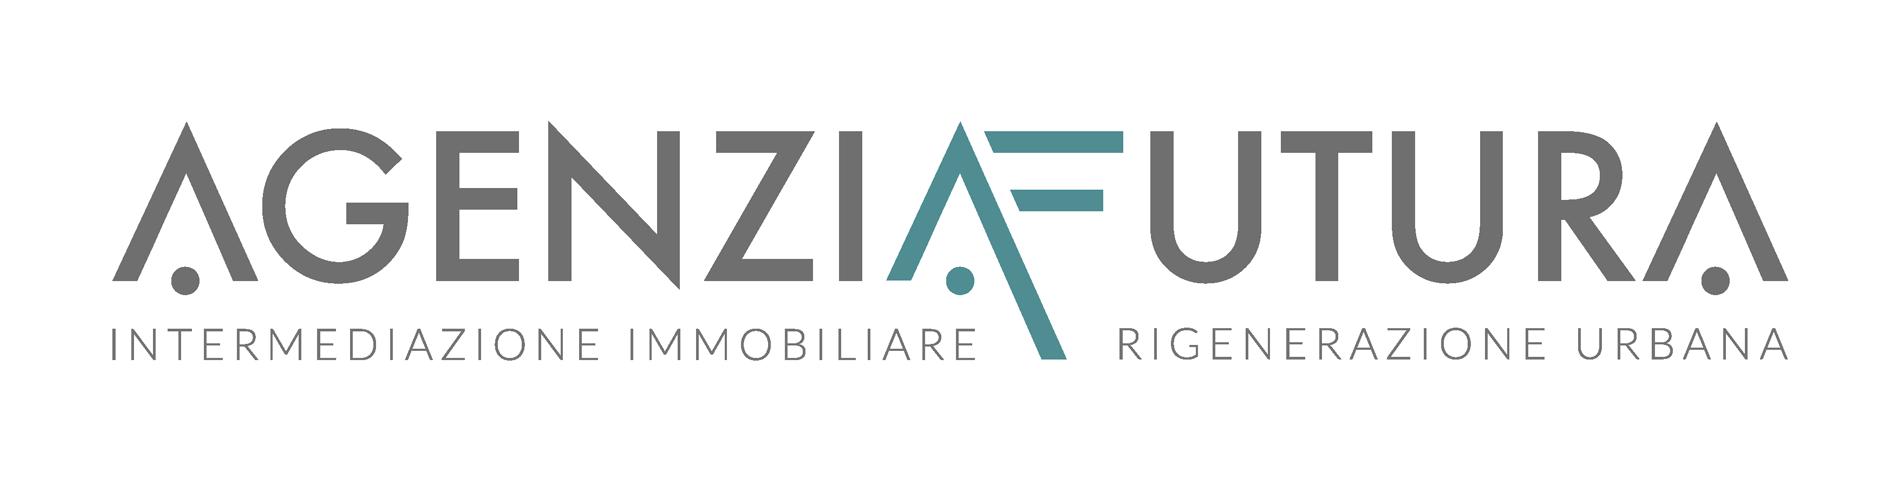 logo agenzia futura